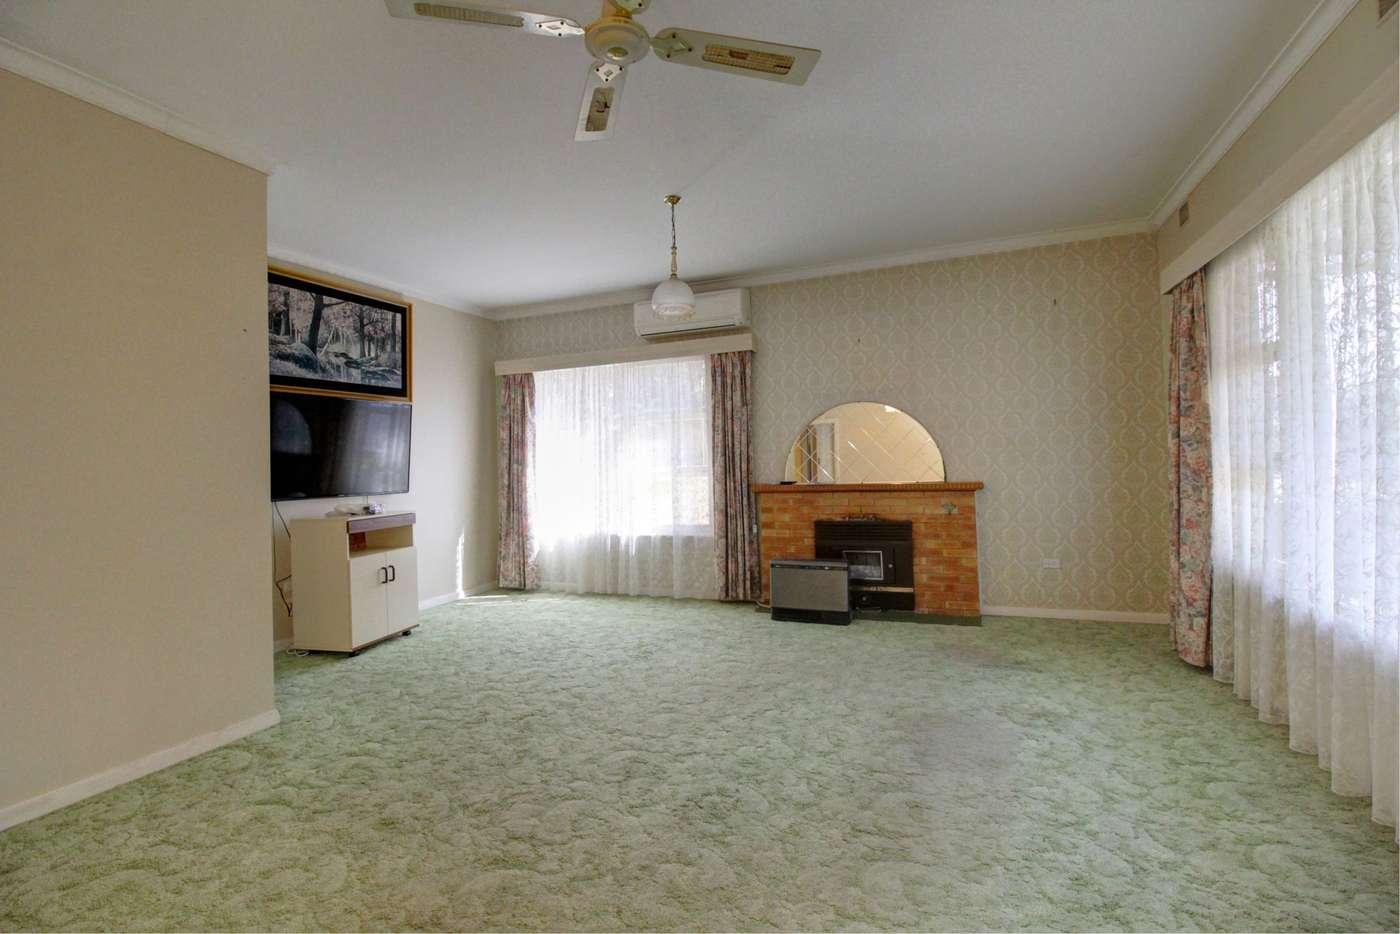 Fifth view of Homely house listing, 24 Nookamka Terrace, Barmera SA 5345